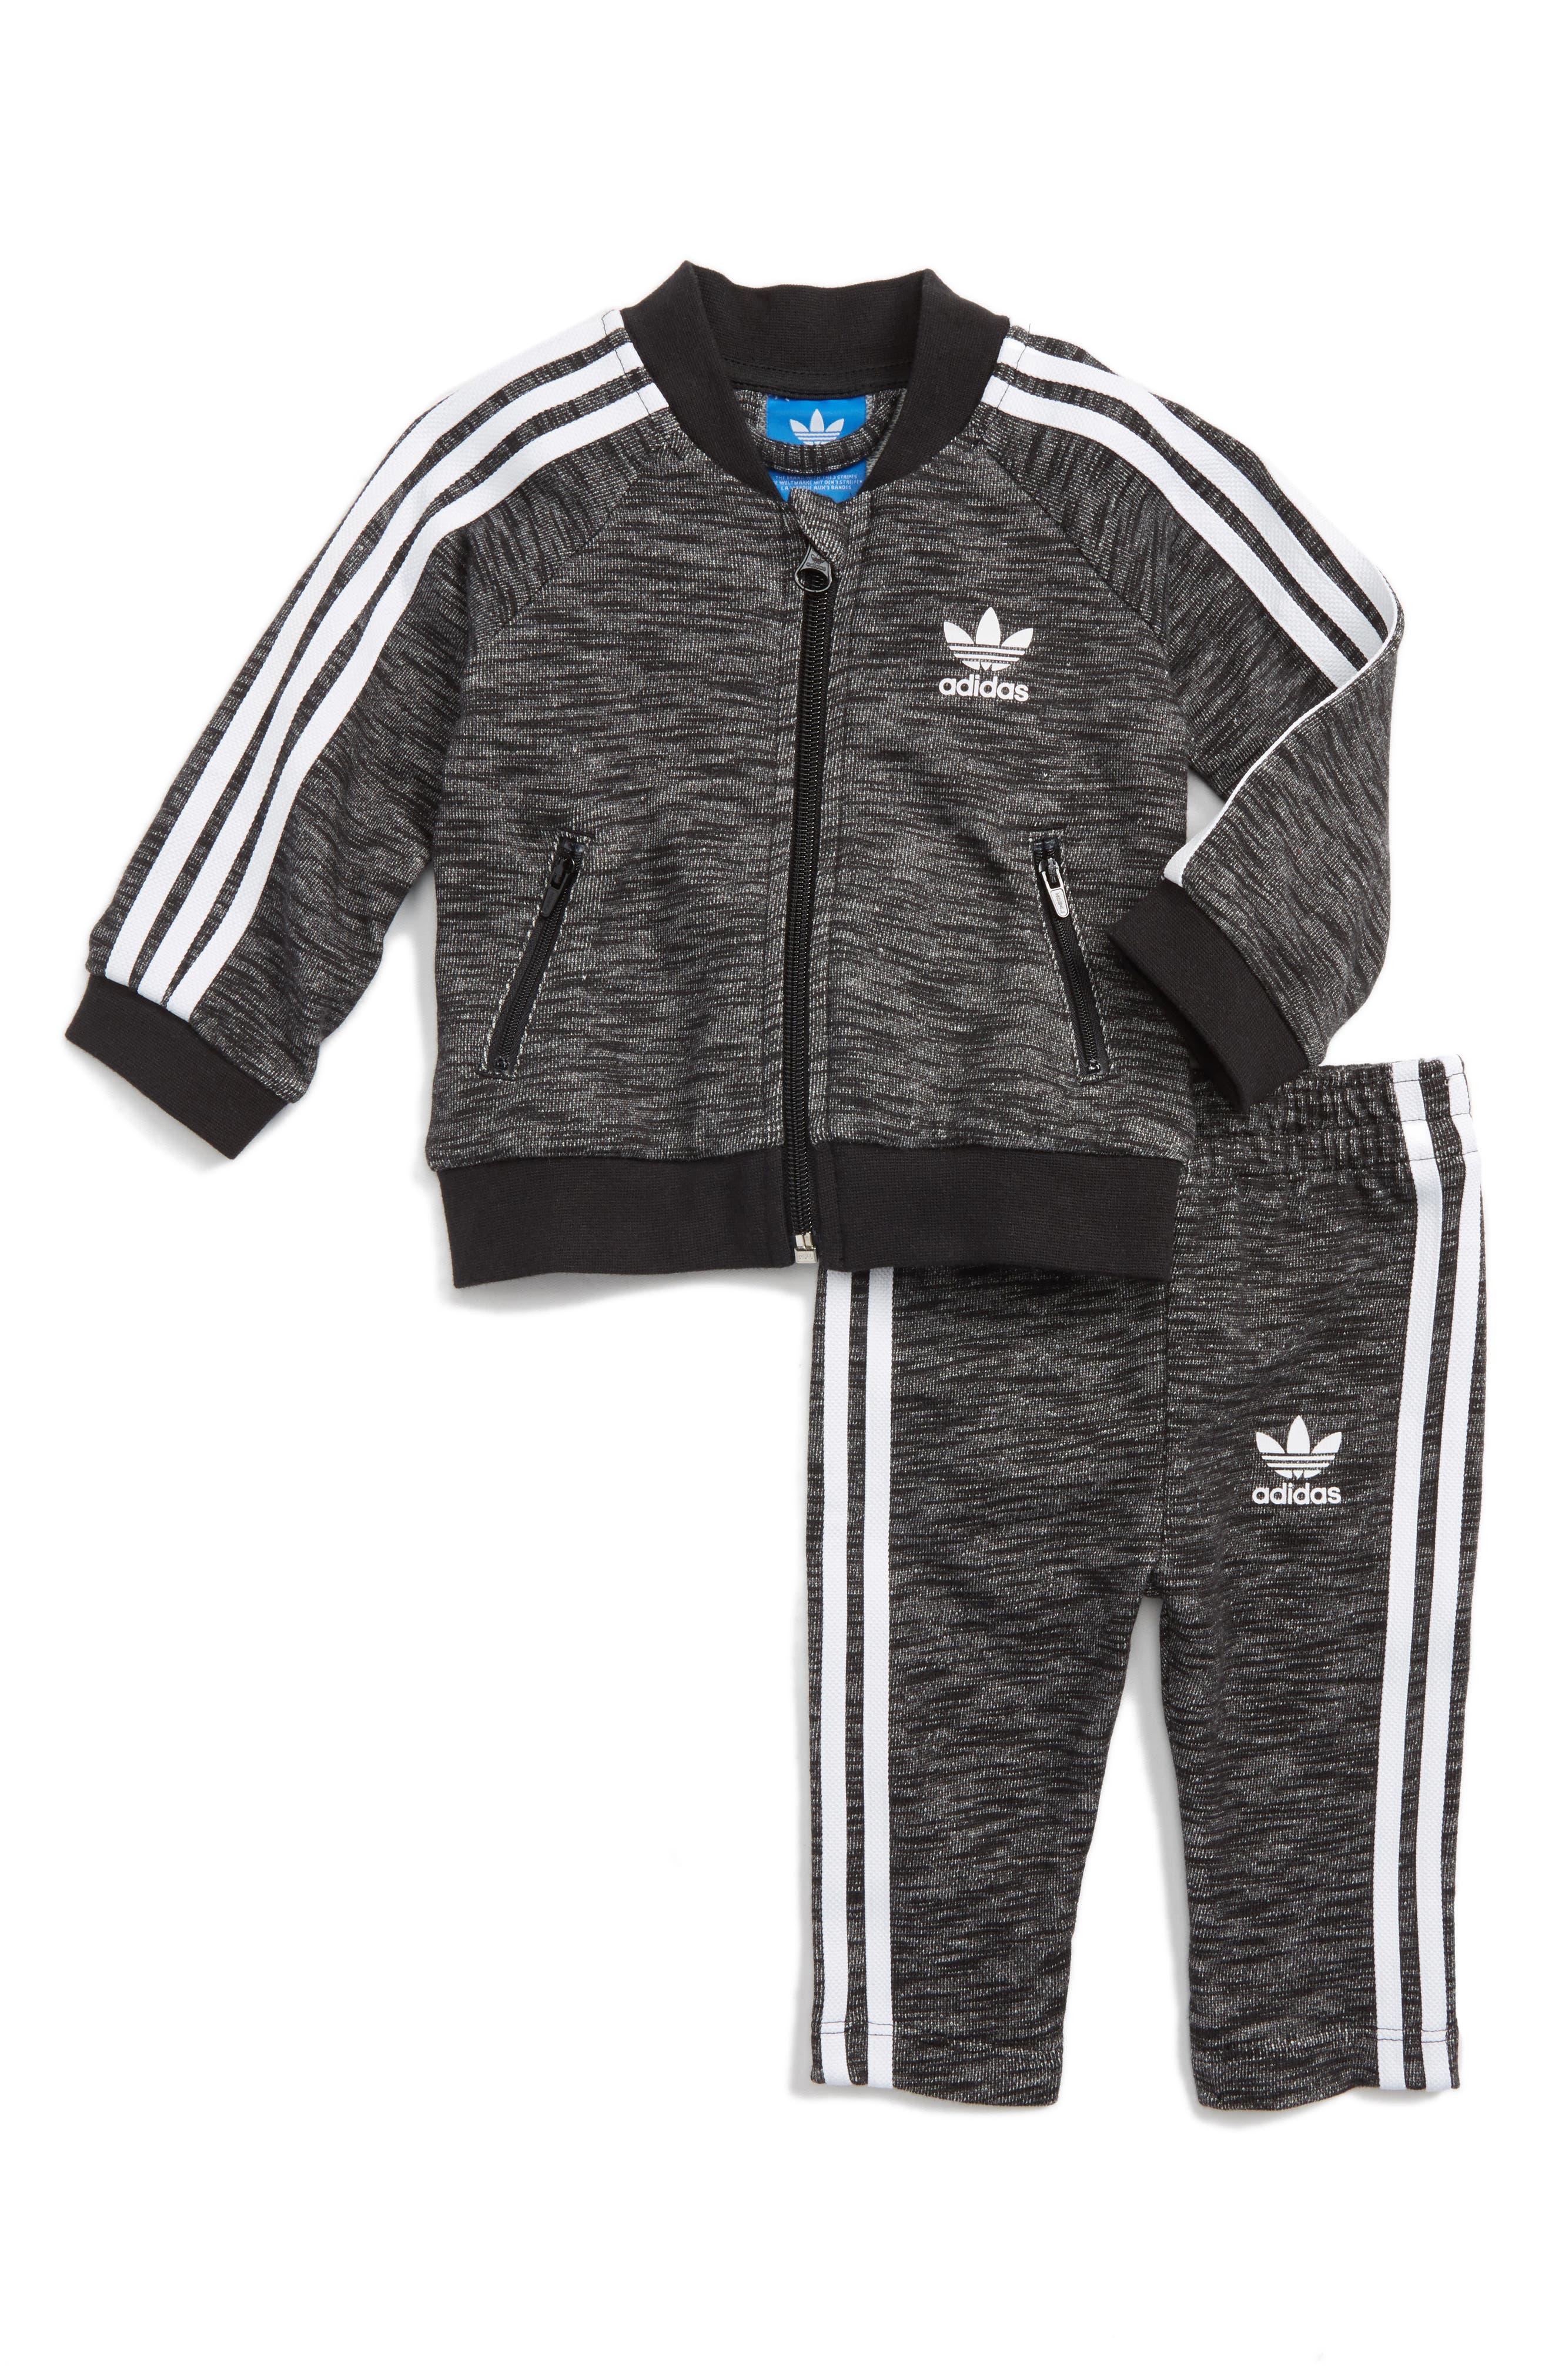 Main Image - adidas Originals Superstar Track Jacket & Pants Set (Baby)